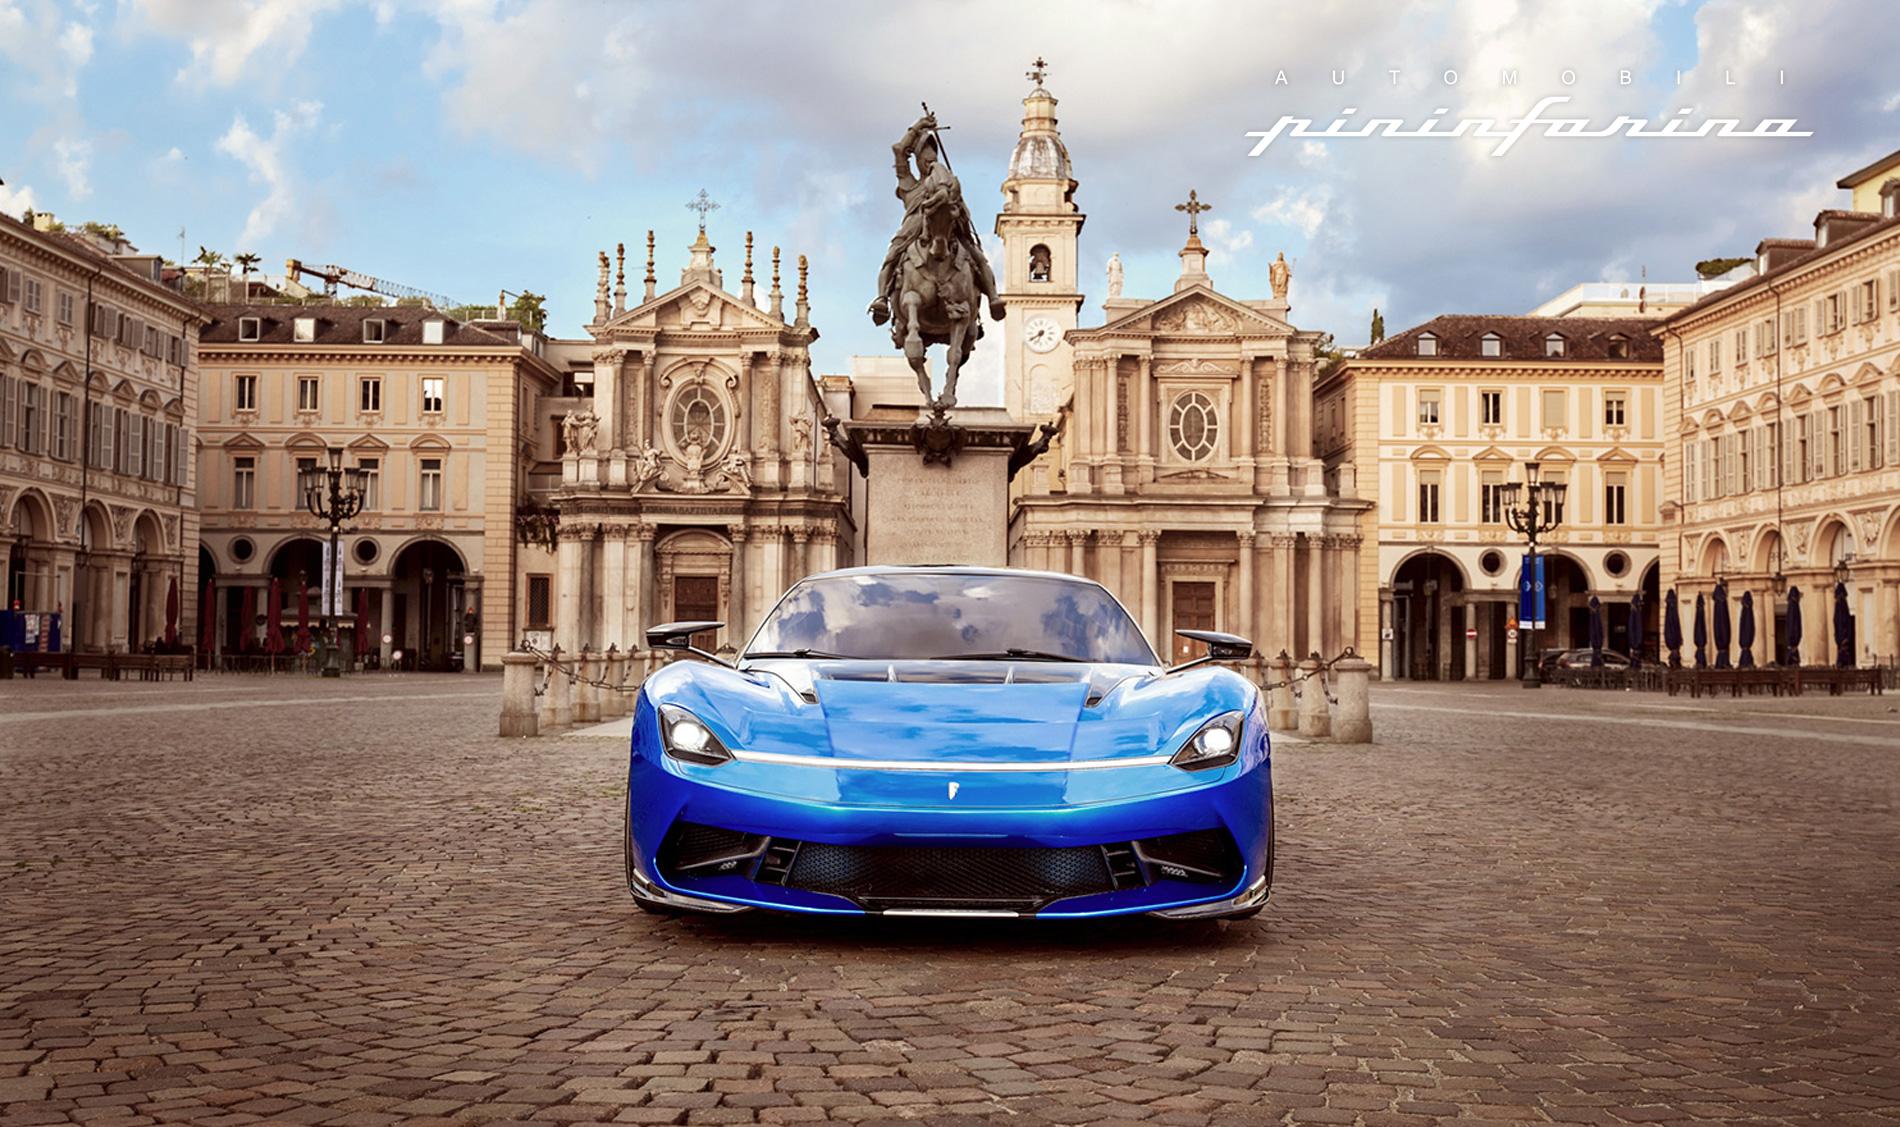 Automobili Pininfarina Turin